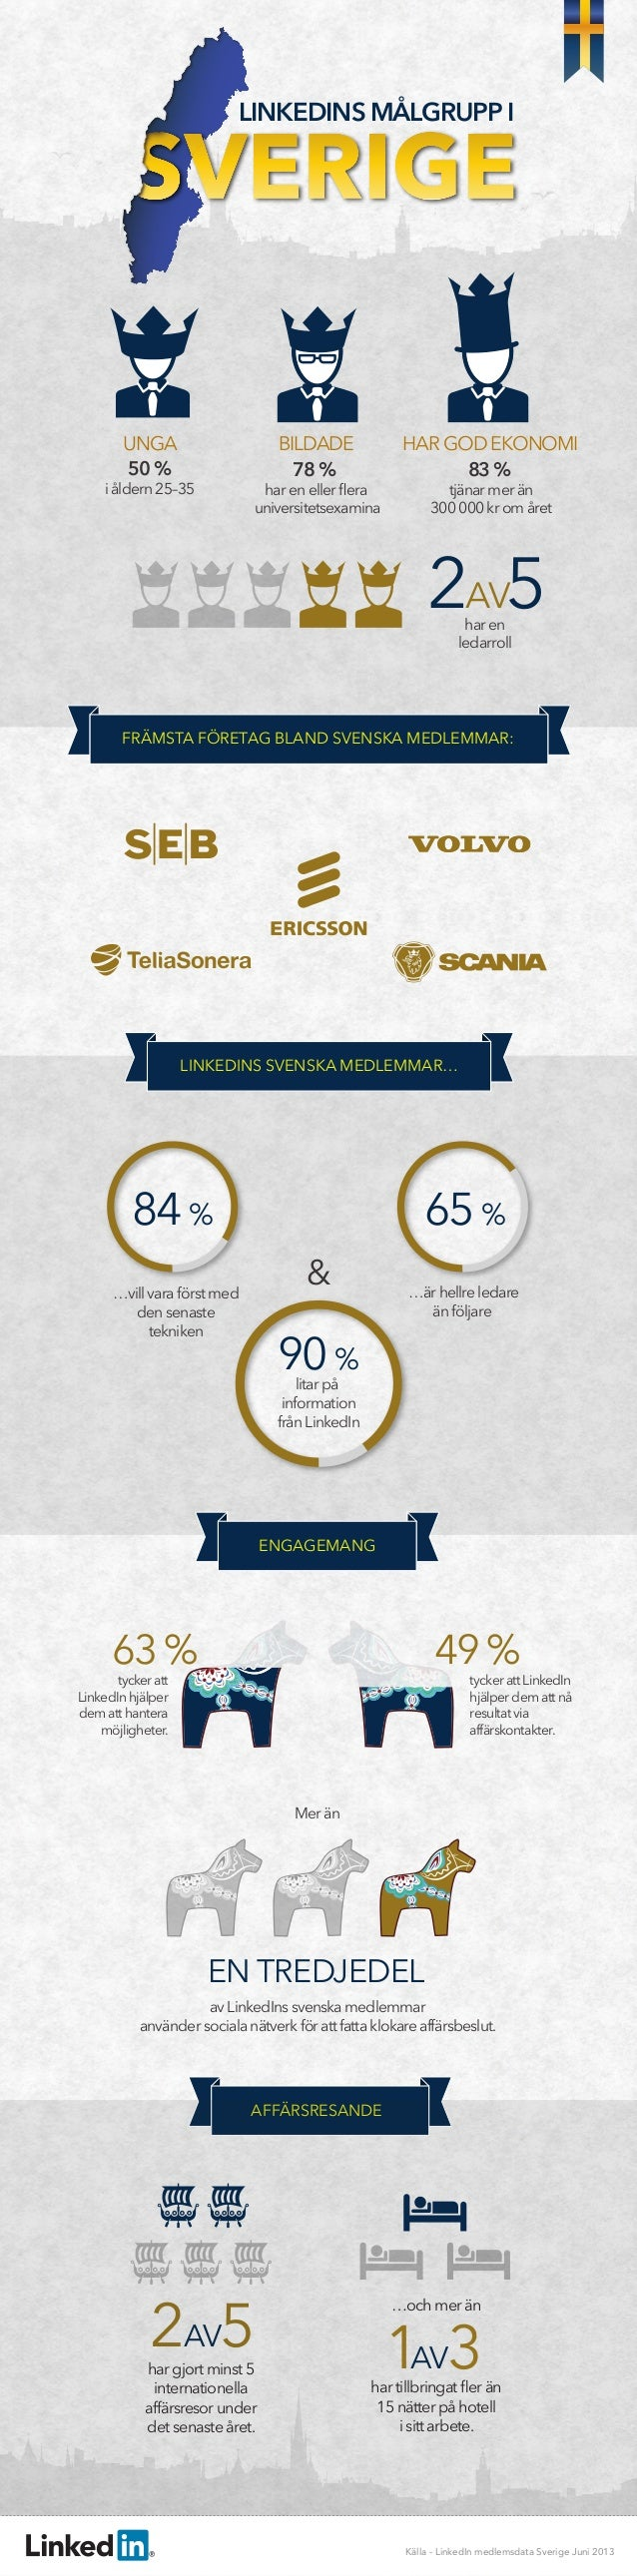 LINKEDINS MÅLGRUPP I  UNGA 50 %  BILDADE 78 %  i åldern 25–35  har en eller flera universitetsexamina  HAR GOD EKONOMI 83 %...